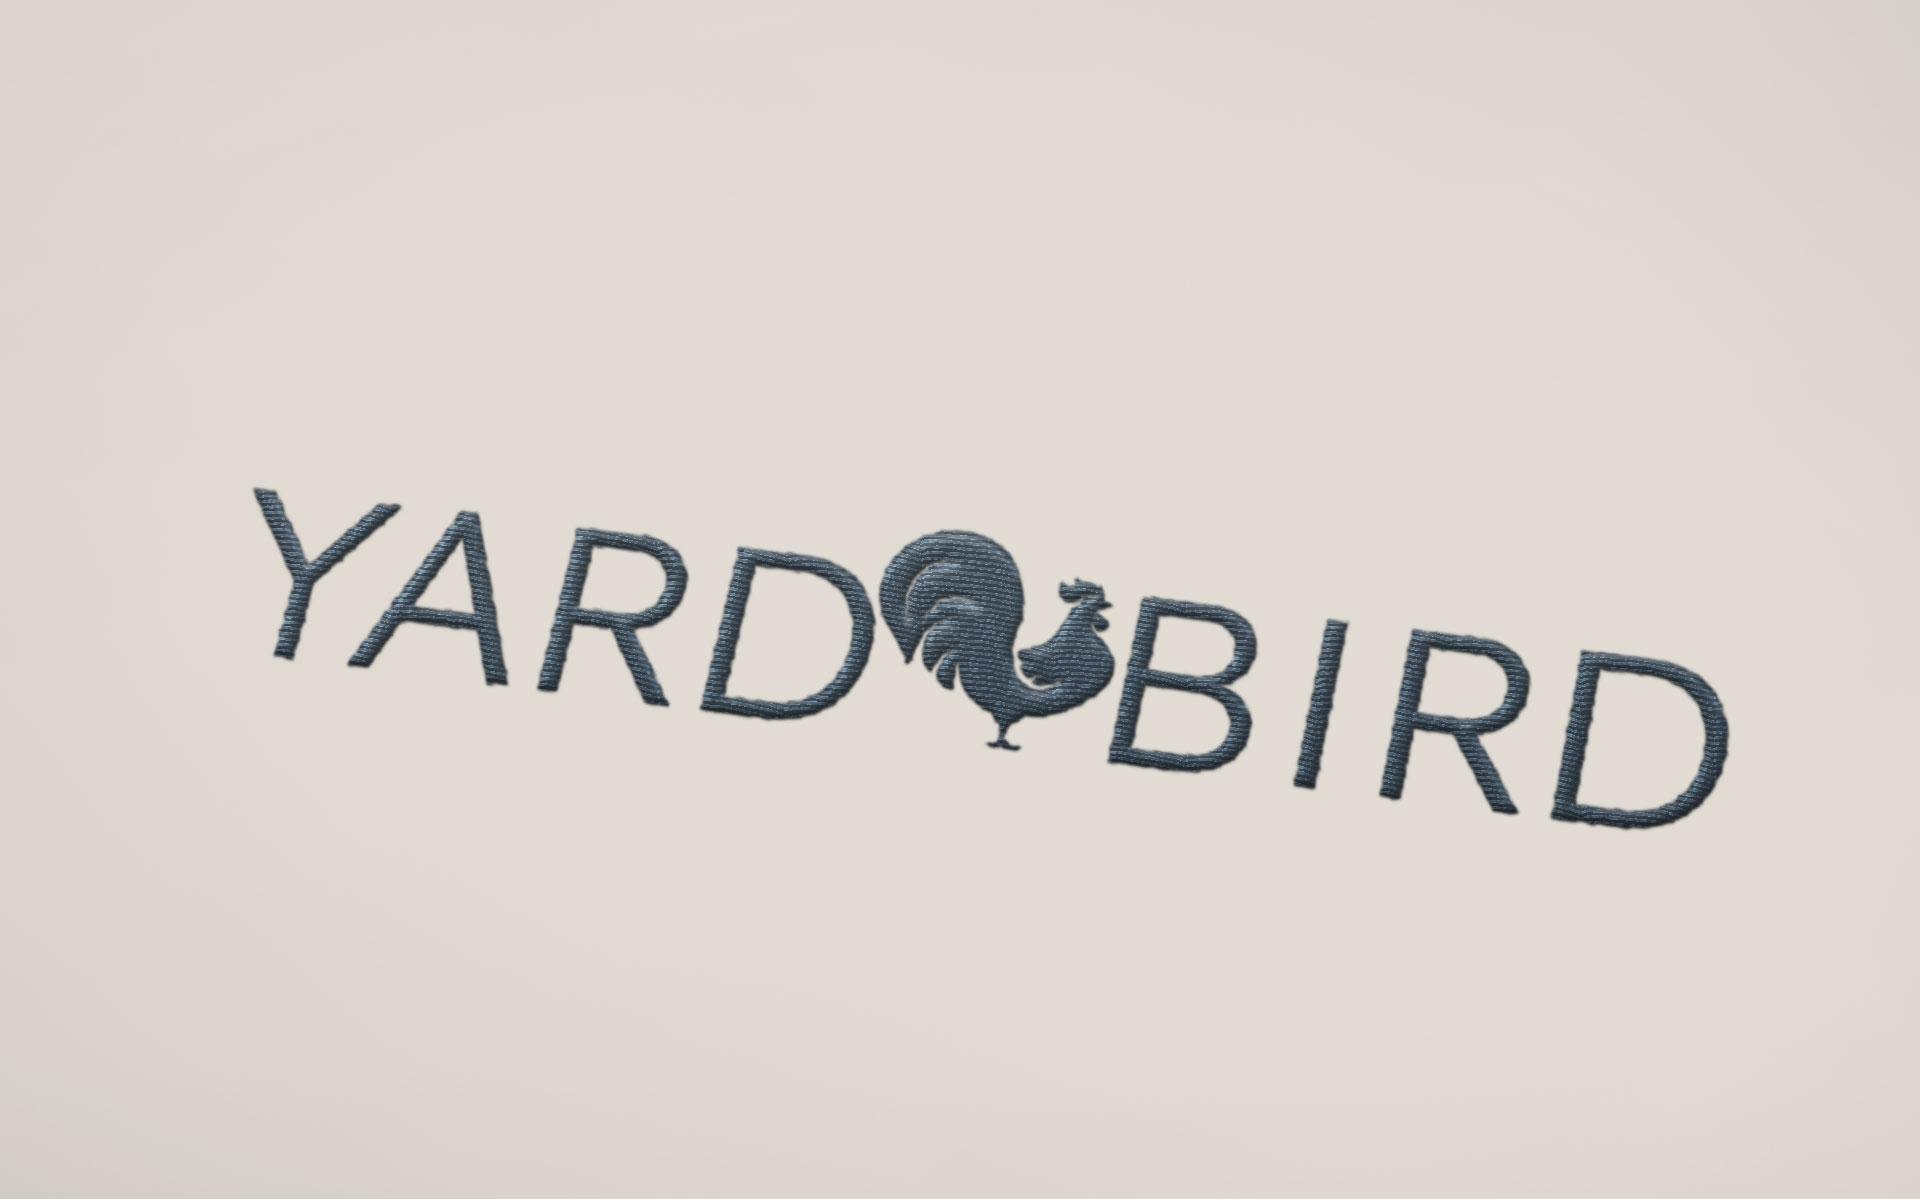 Yardbird branding designed by Amy at Yellow Sunday